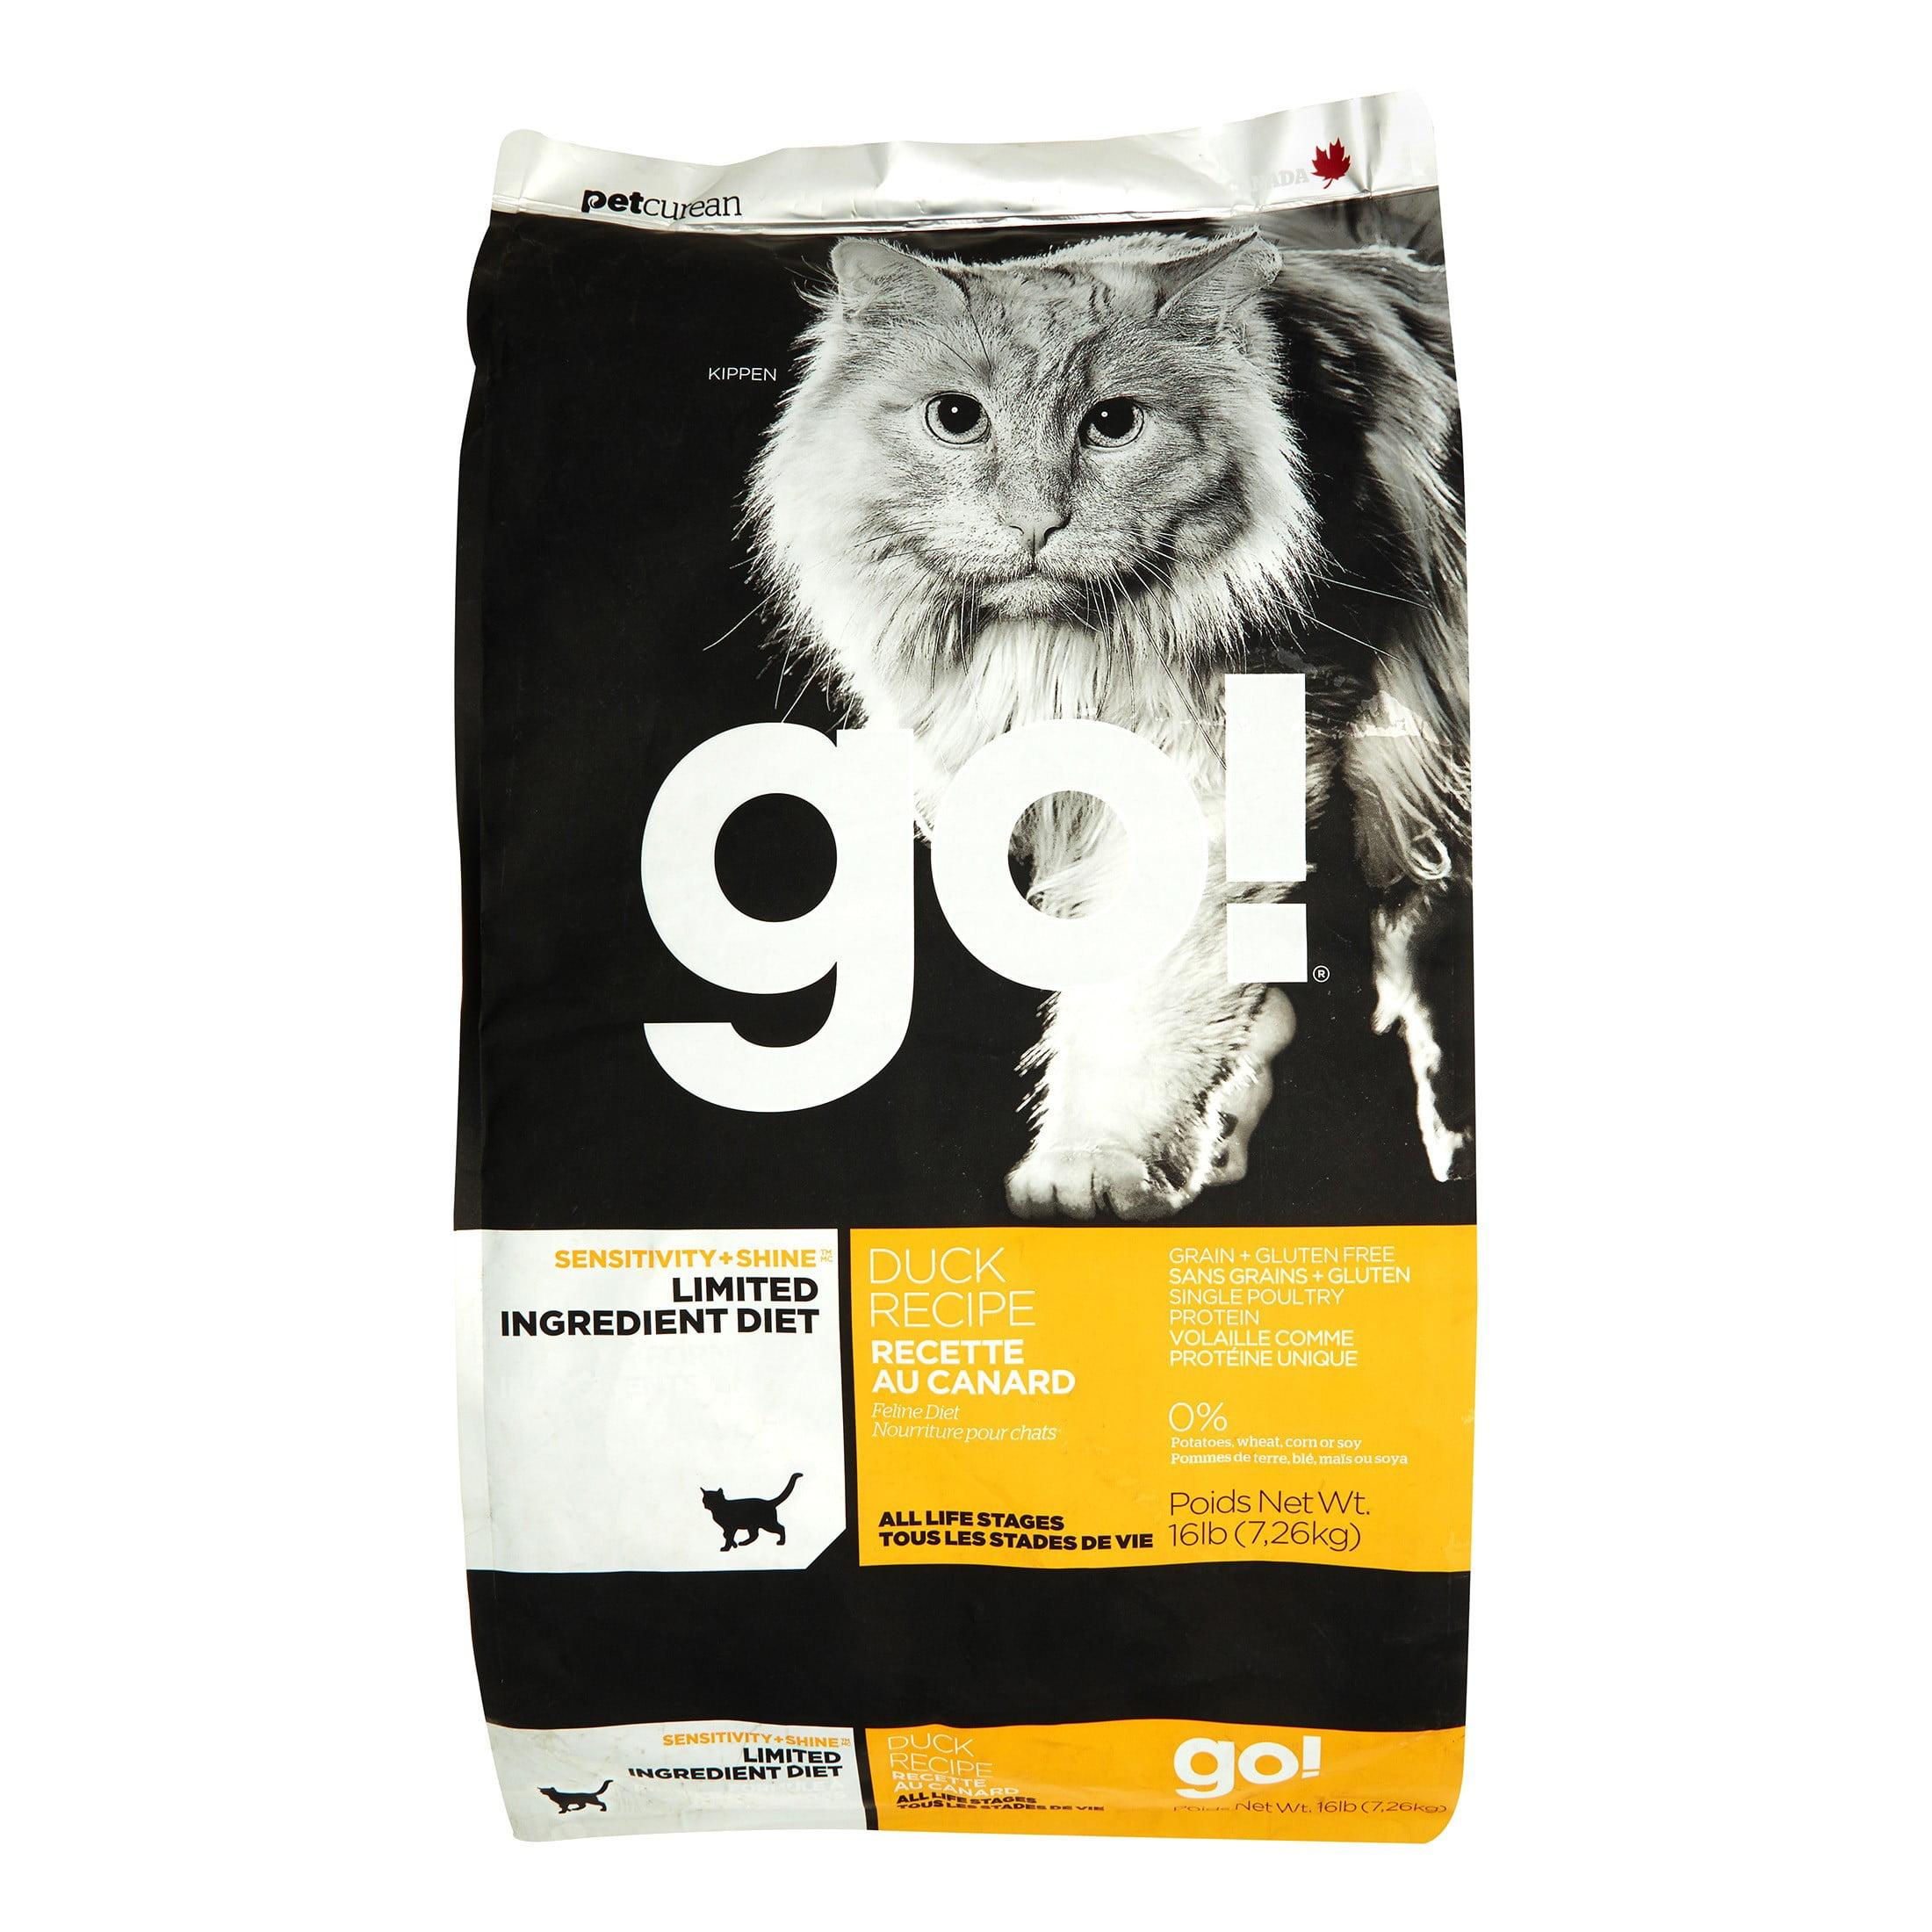 Petcurean Go! Sensitivity + Shine Limited Ingredient Grain-Free Duck Recipe Dry Cat Food, 16 lb